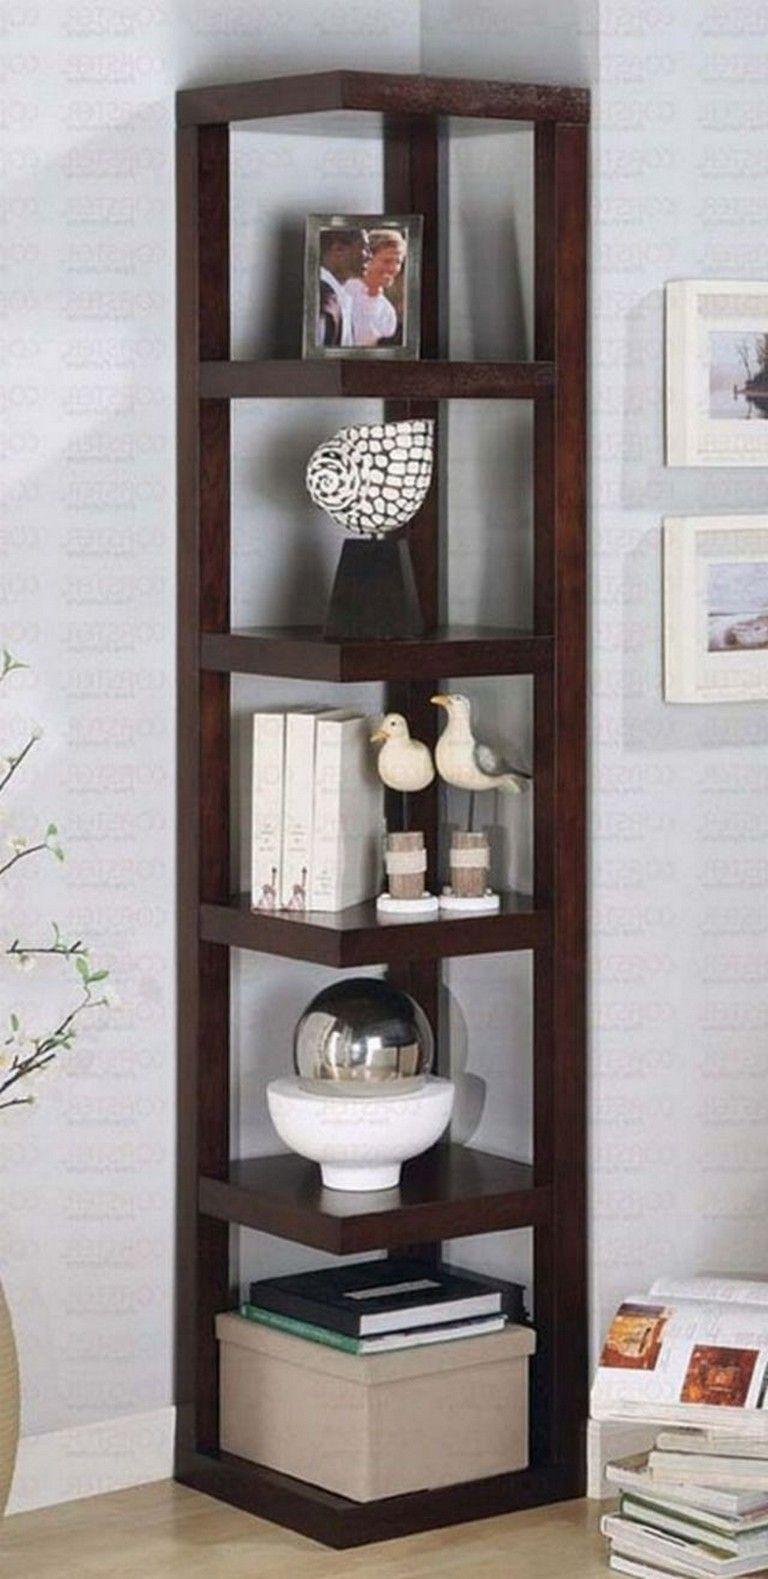 20 Amazing Corner Shelves Design Ideas For Your Living Room